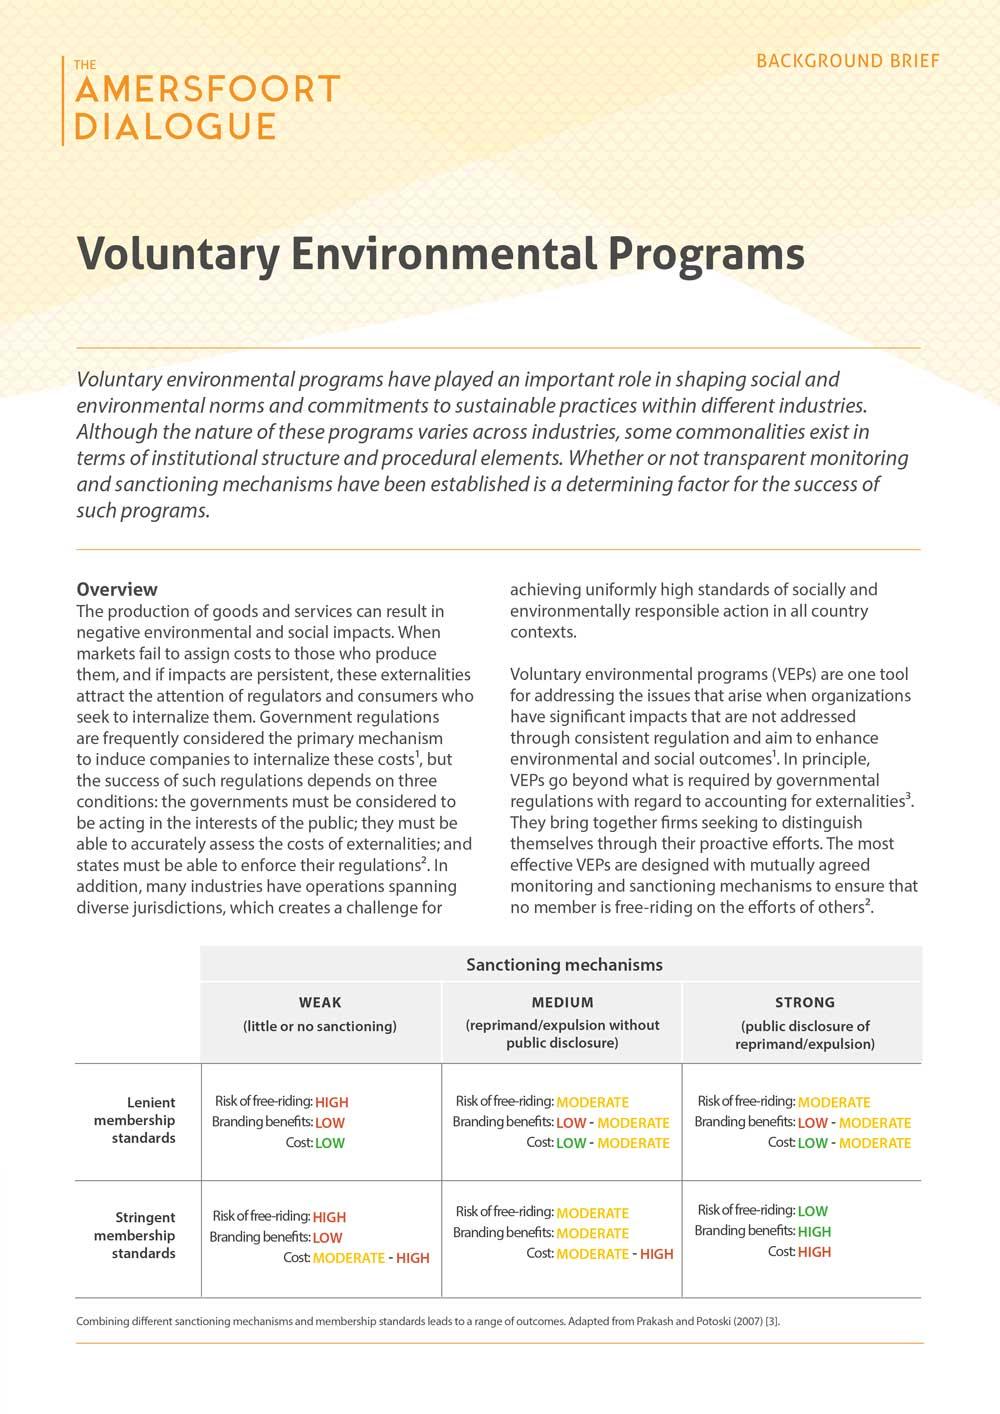 Voluntary Environmental Programs